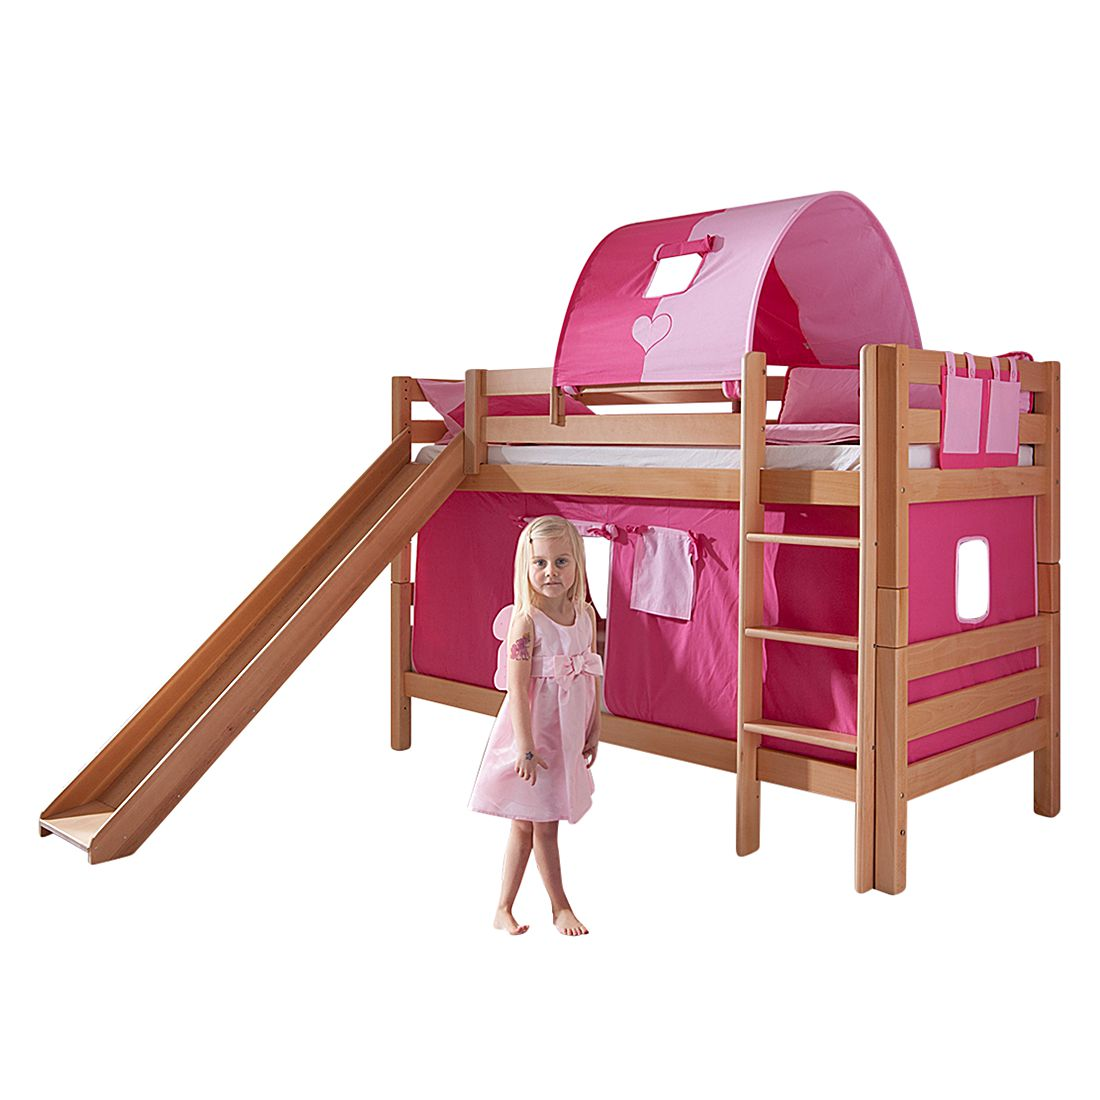 Spielbett Beni | Kinderzimmer | Braun | Massivholz - Holz | Relita